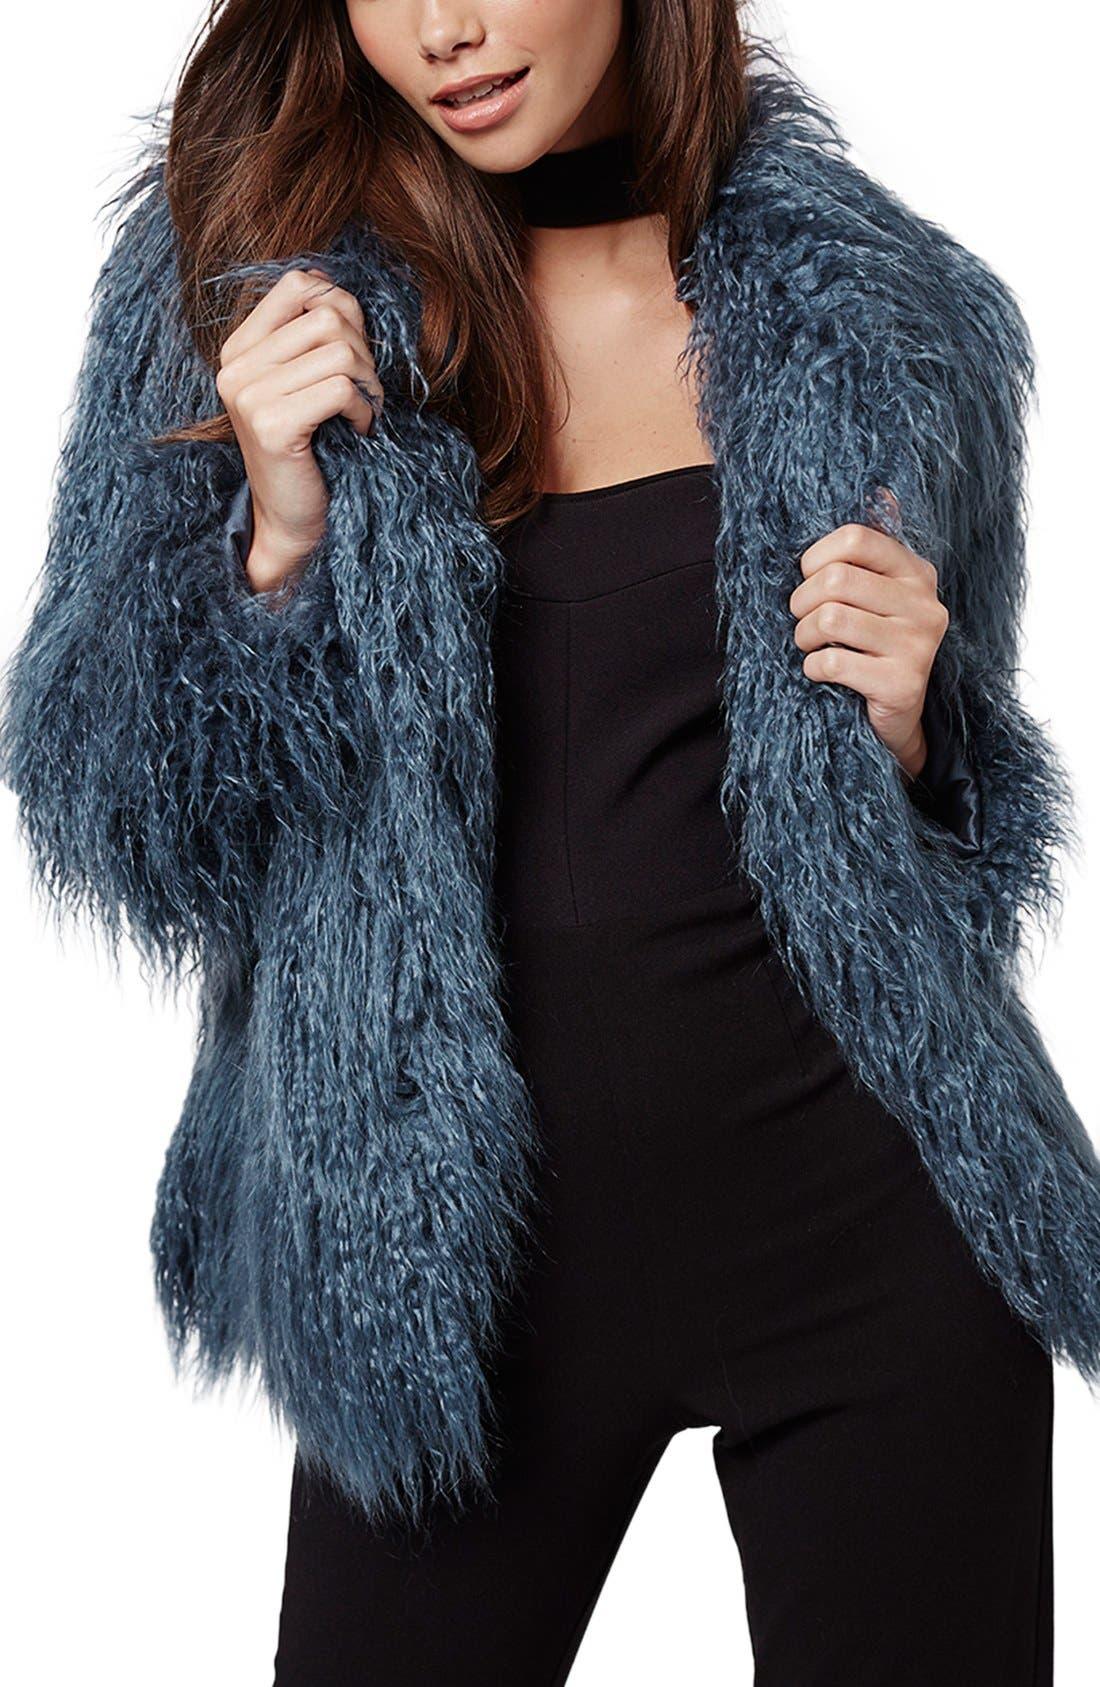 Main Image - KENDALL + KYLIE at Topshop Faux Fur Coat